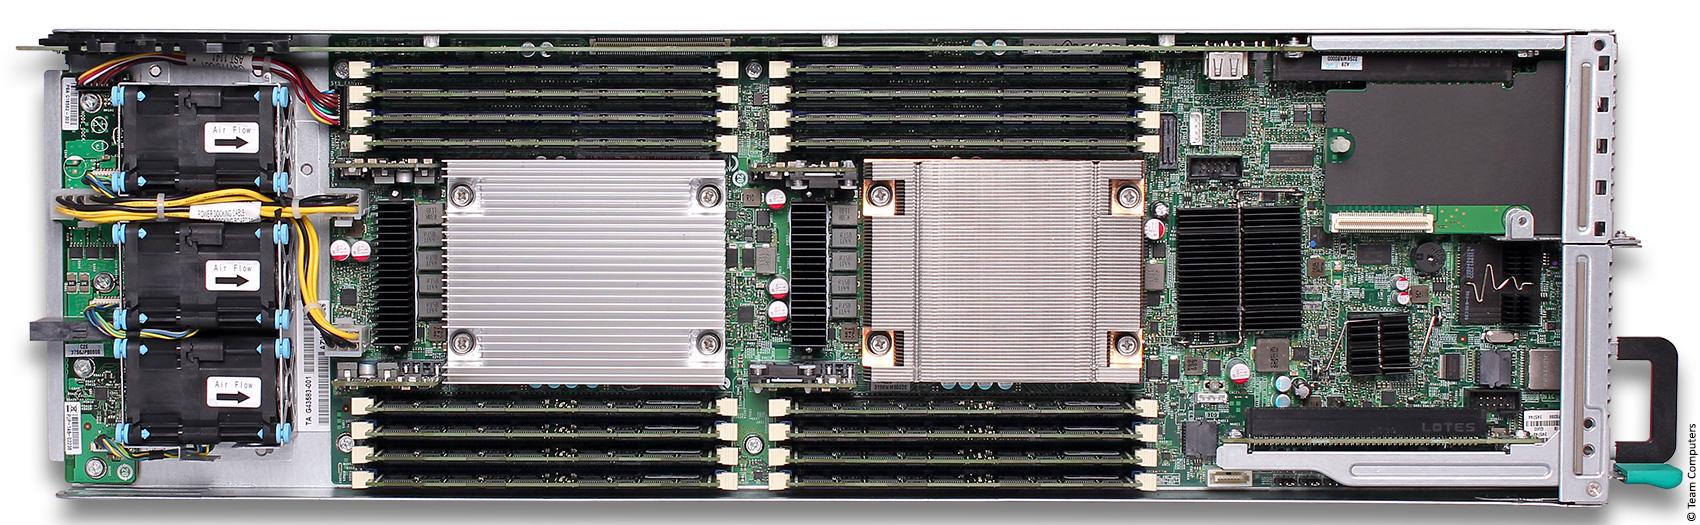 Intel-H2304JP(WP)_4dimm_1700[1]